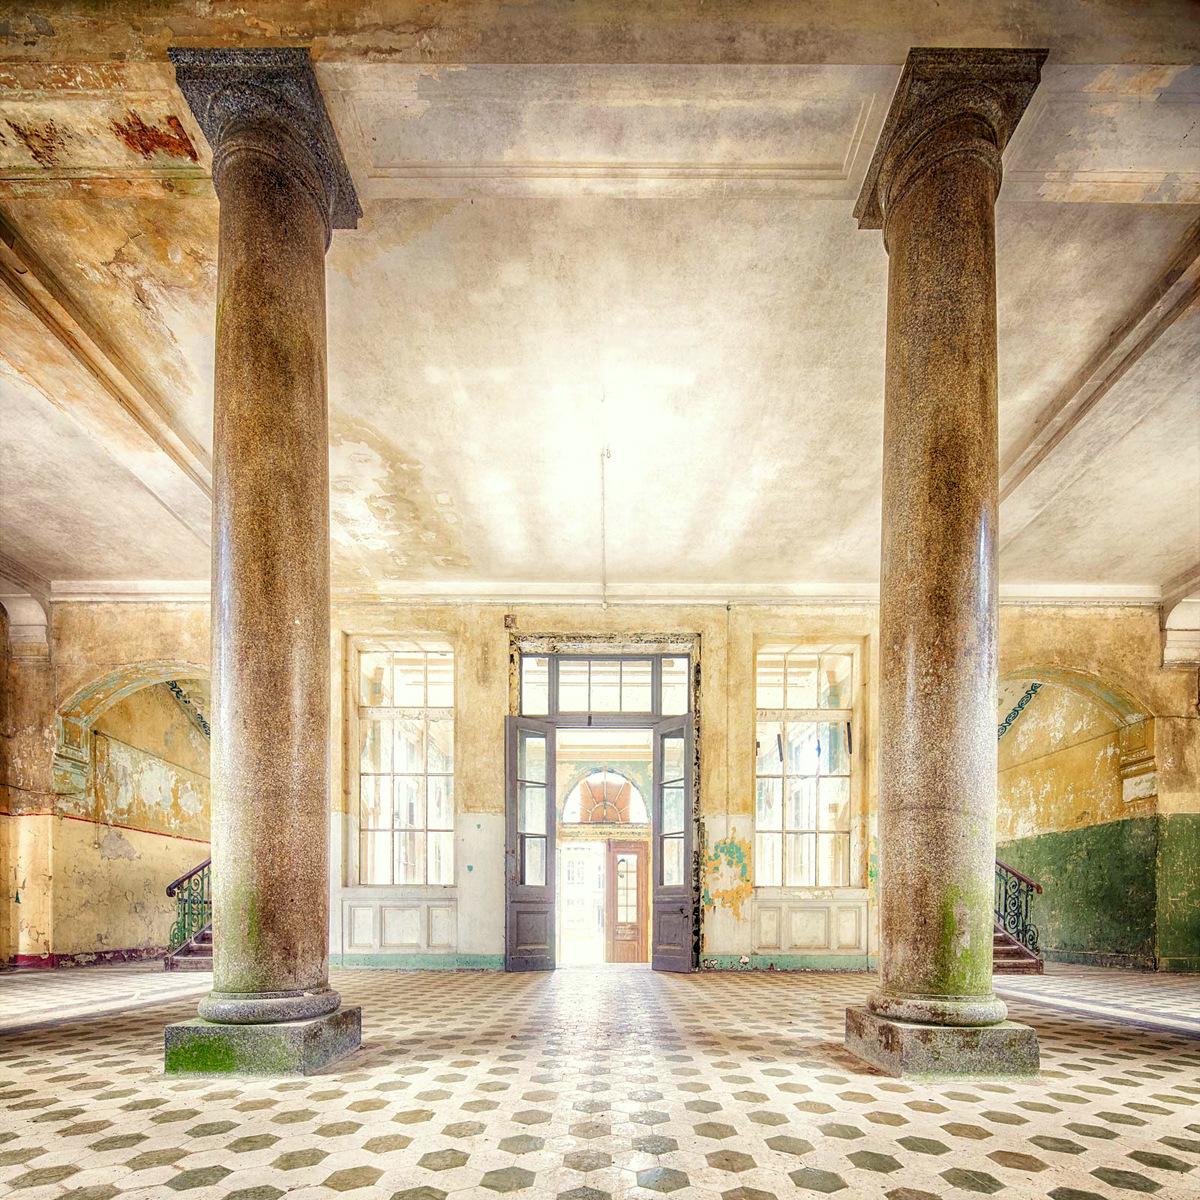 Decay series VI by Markus Studtmann